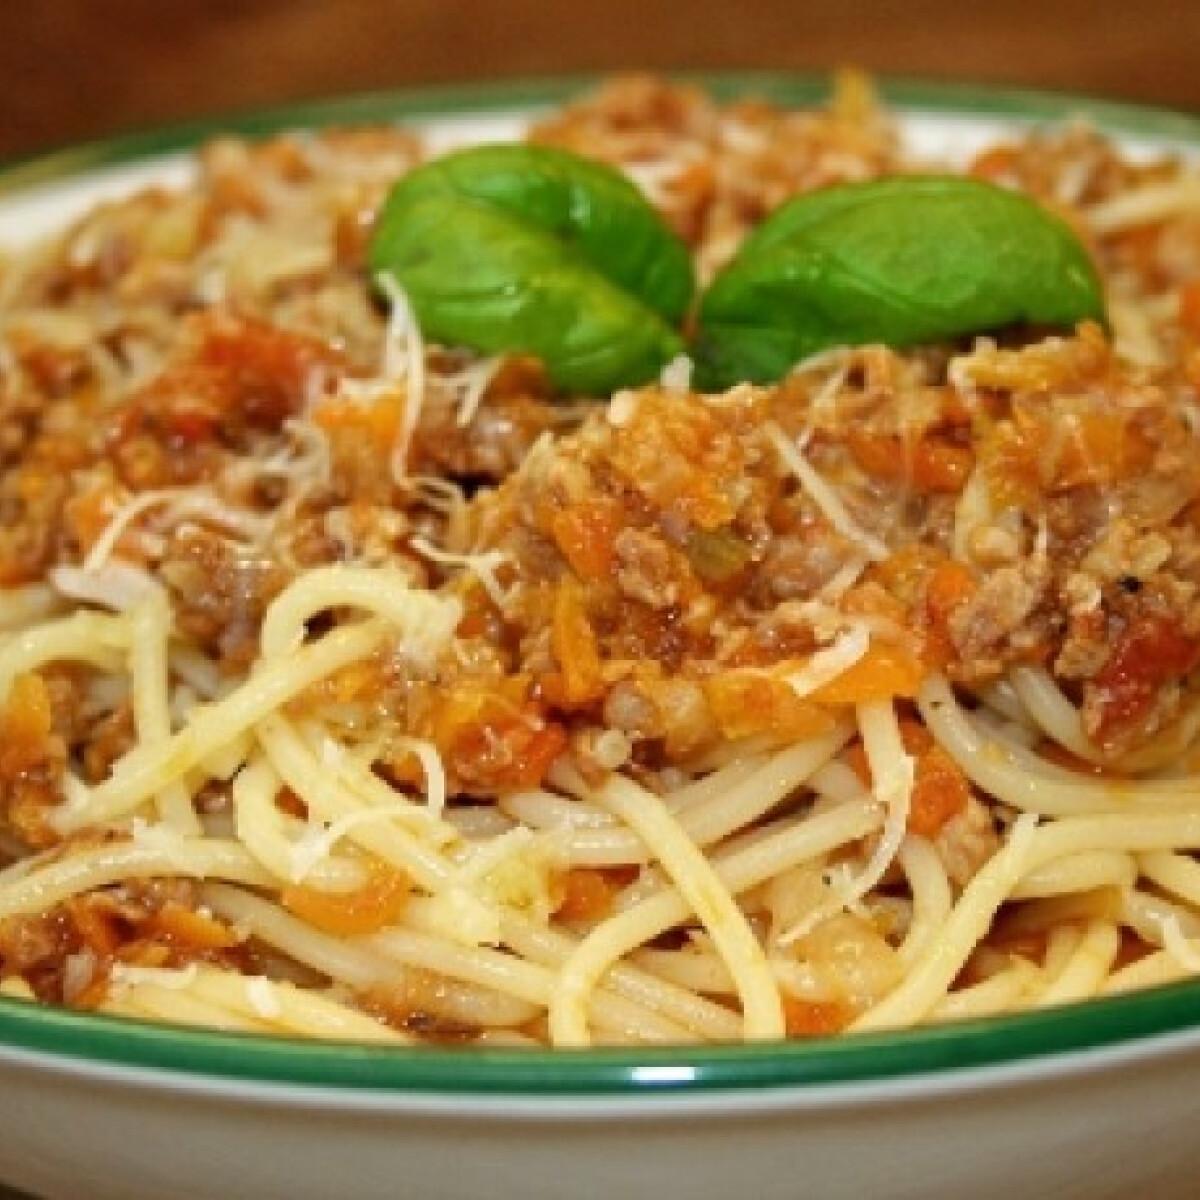 Ezen a képen: Bolognai spagetti Vicikó konyhájából